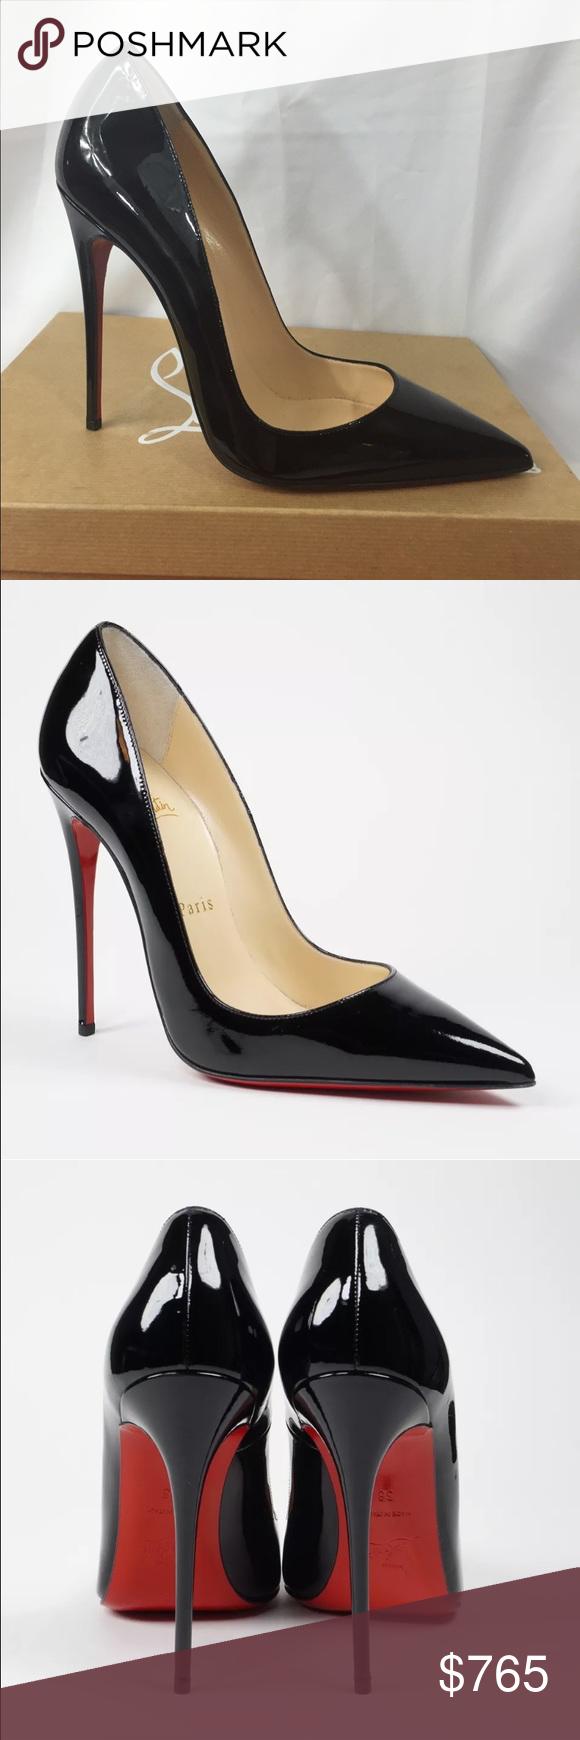 80d16e9e21eb Christian Louboutin So Kate 120 Patent Leather 38 Size  EU 38 (Runs small